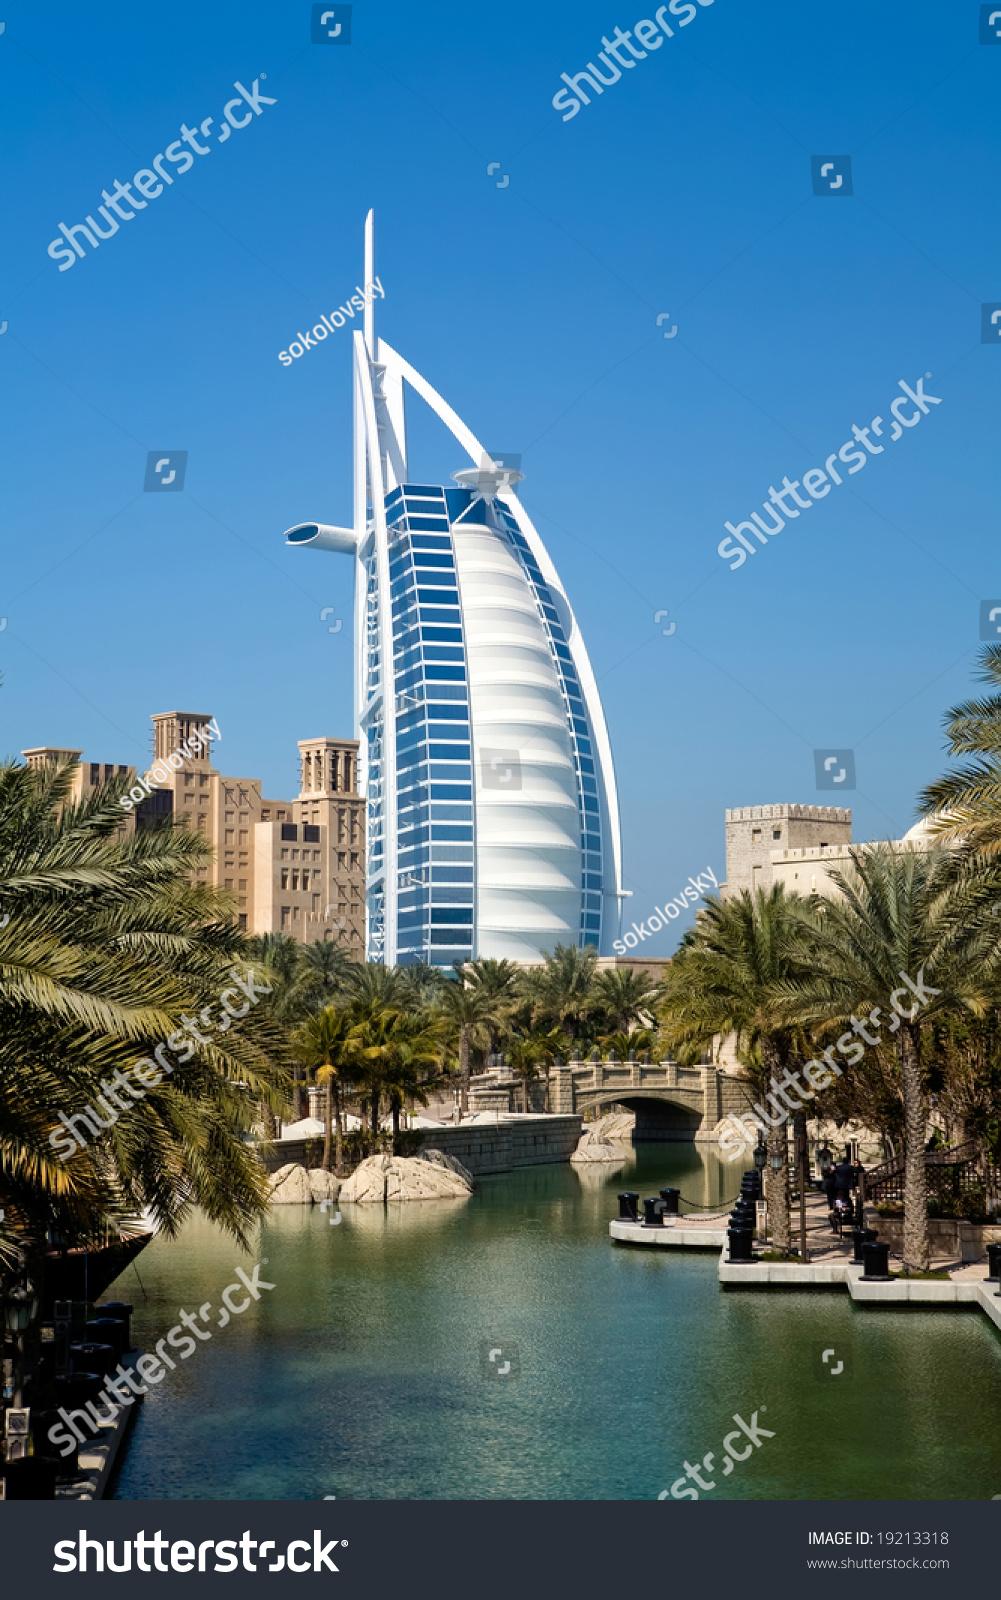 Beautiful shopping mall souk madinat jumeirah and famous for Hotel dubai famous